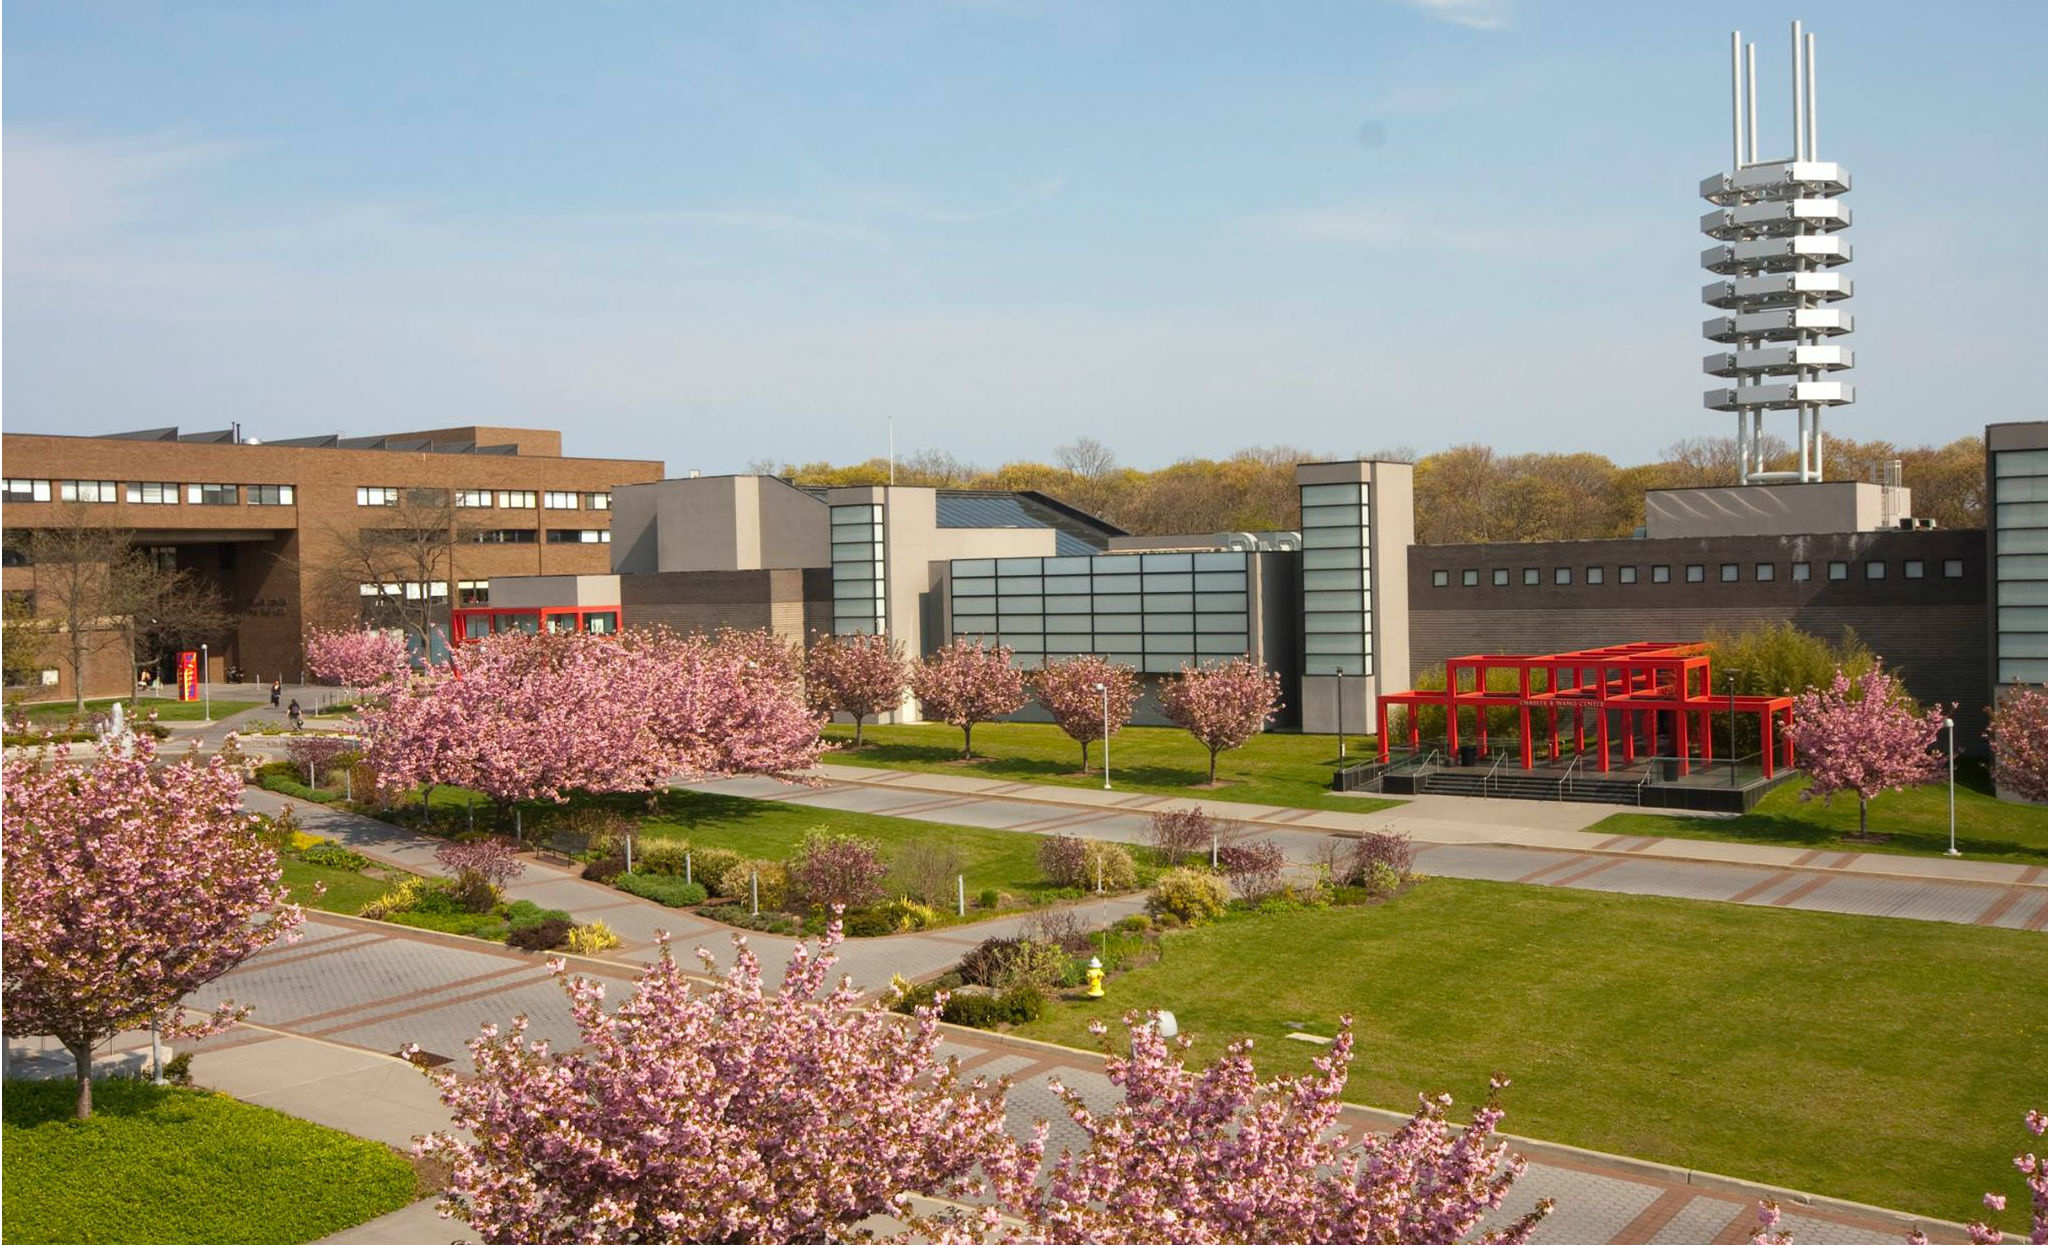 SUNY Stony Brook 石溪大學 - 紐約長島最耀眼的光芒 - 美國大學|申請大學|百大名校|國外留學|XL ACADEMY|國際學校